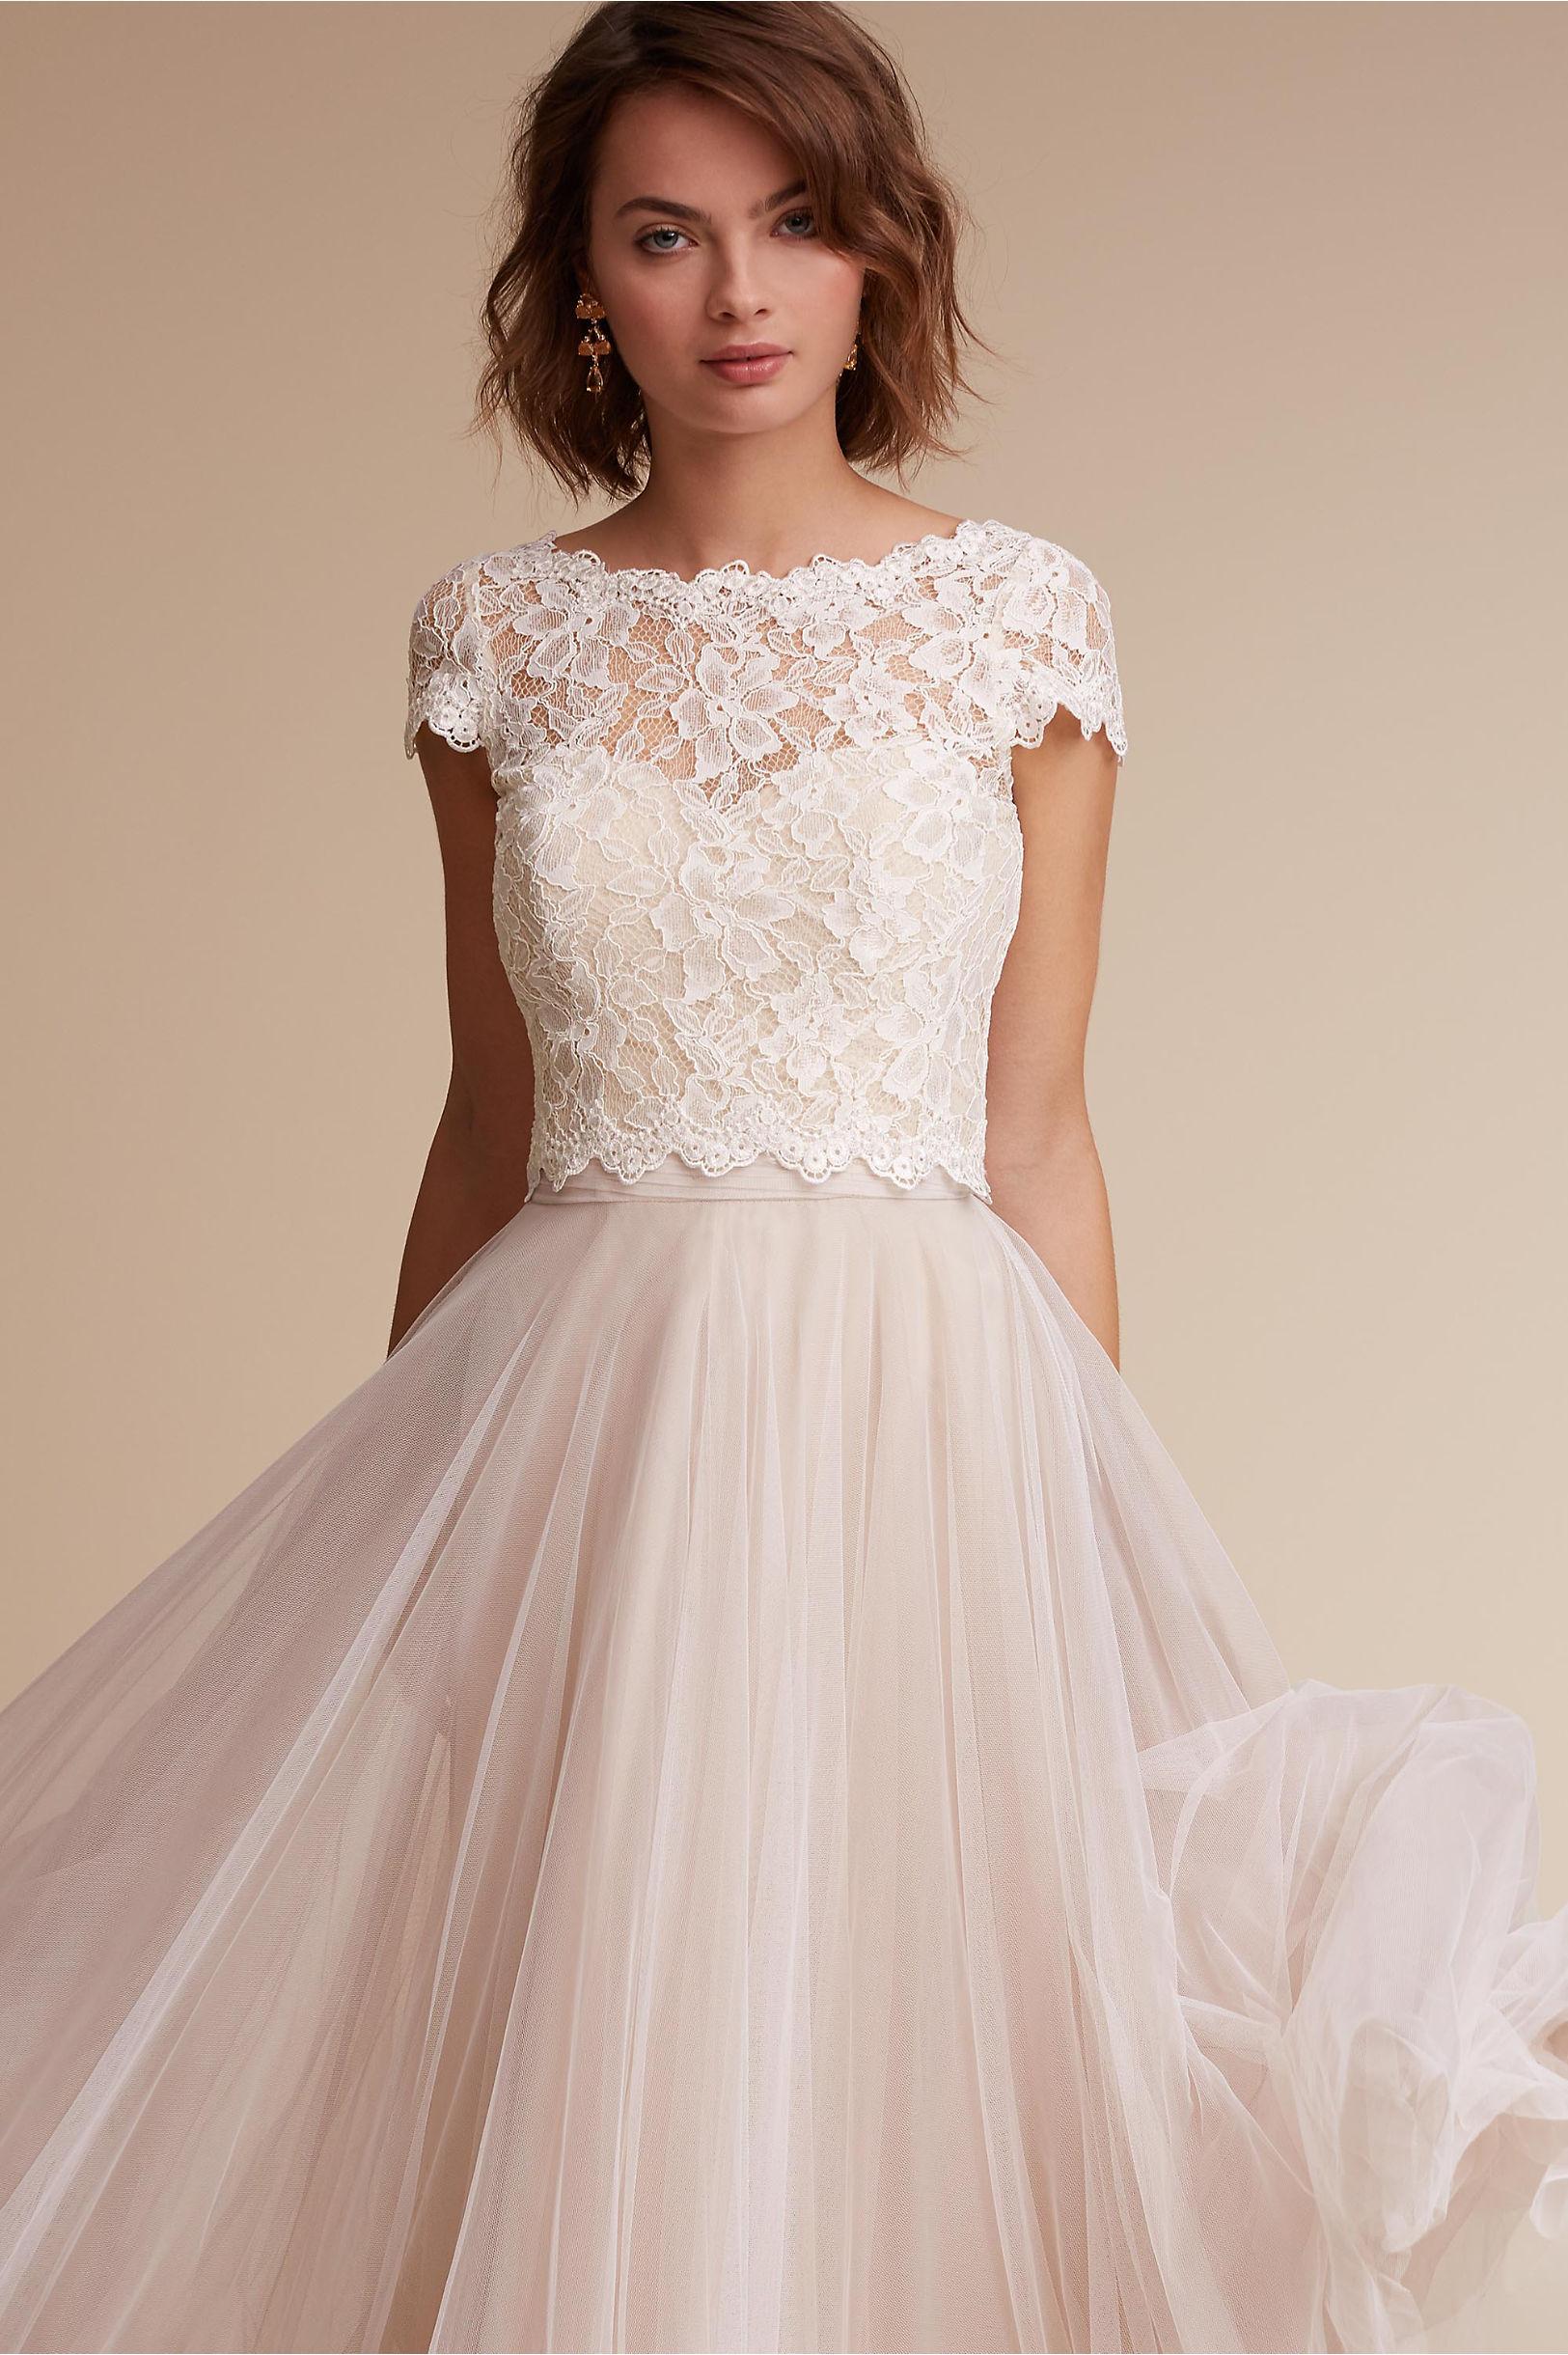 Lace Wedding Dress Topper Wedding Ideas